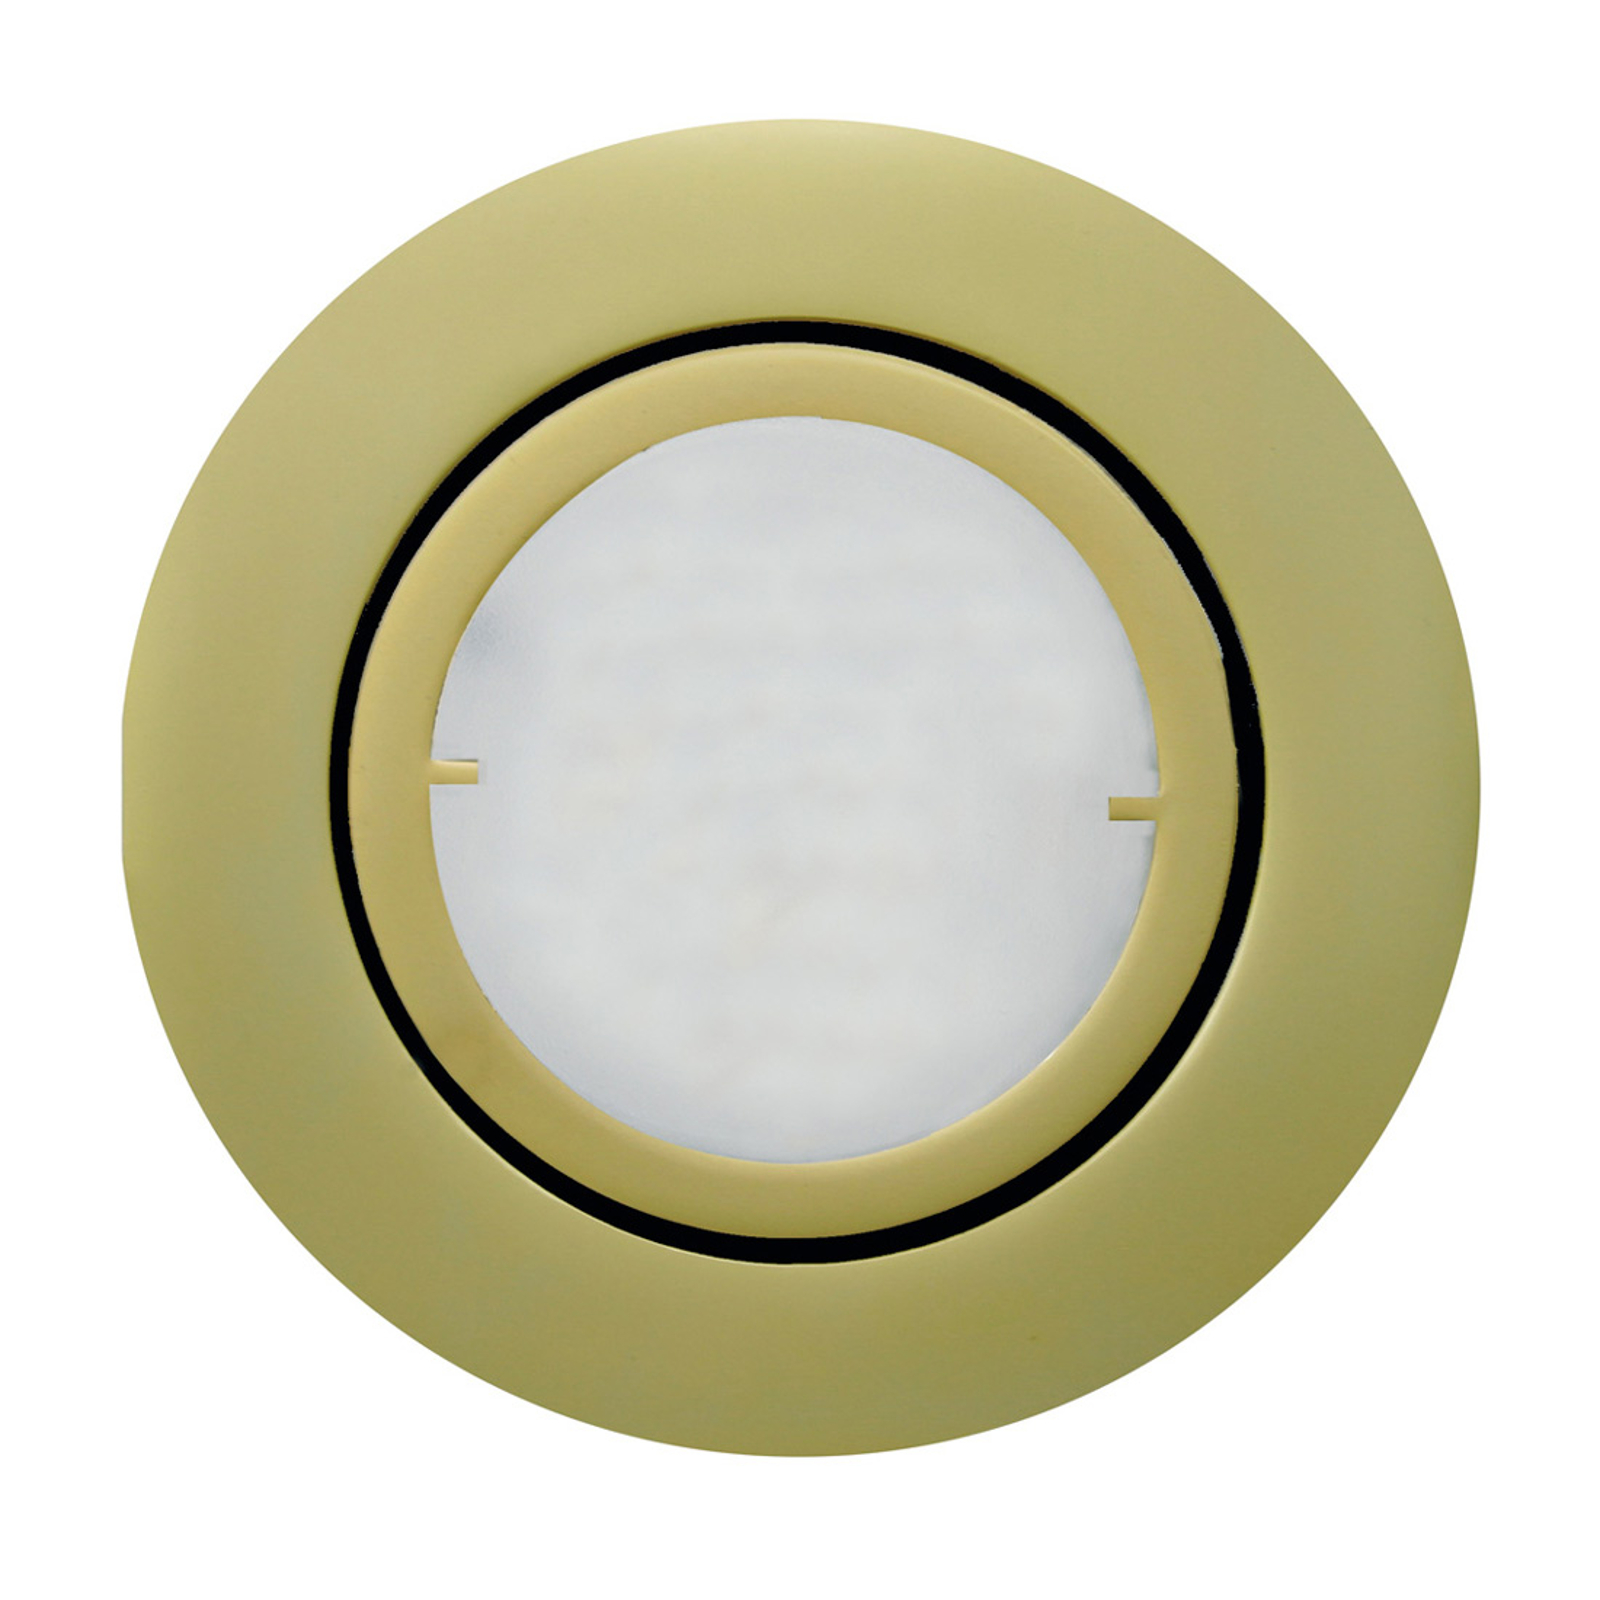 Mattgyllene LED-inbyggnadslampa Joanie